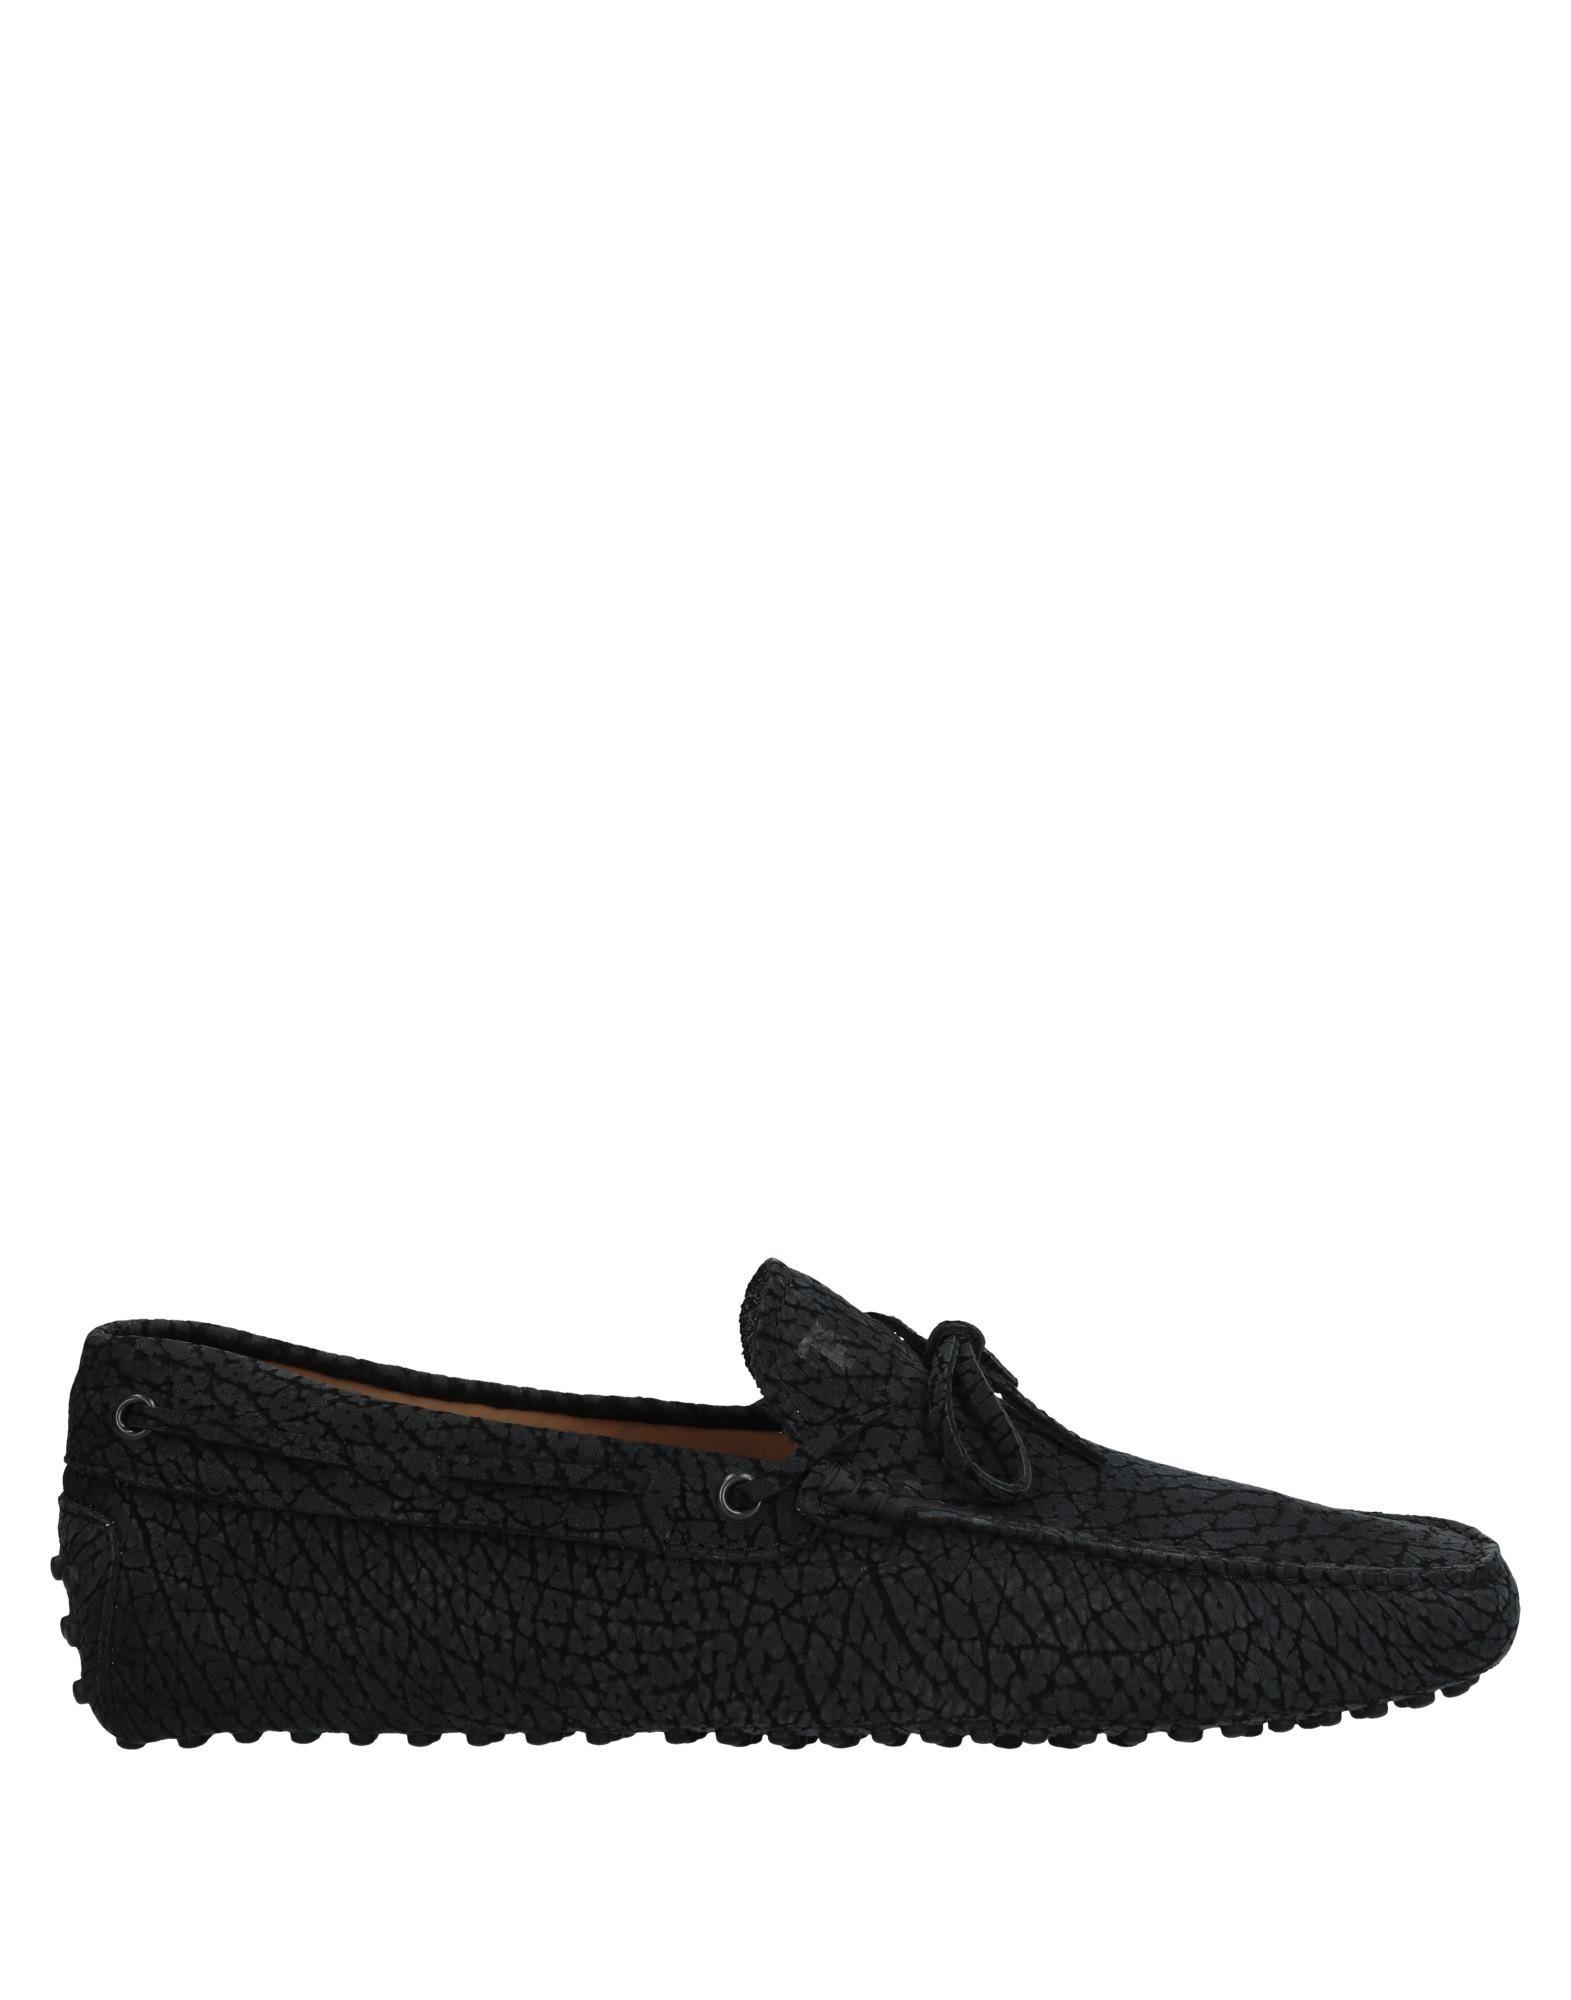 Tod's Mokassins Herren  11544465EJ Gute Qualität beliebte Schuhe